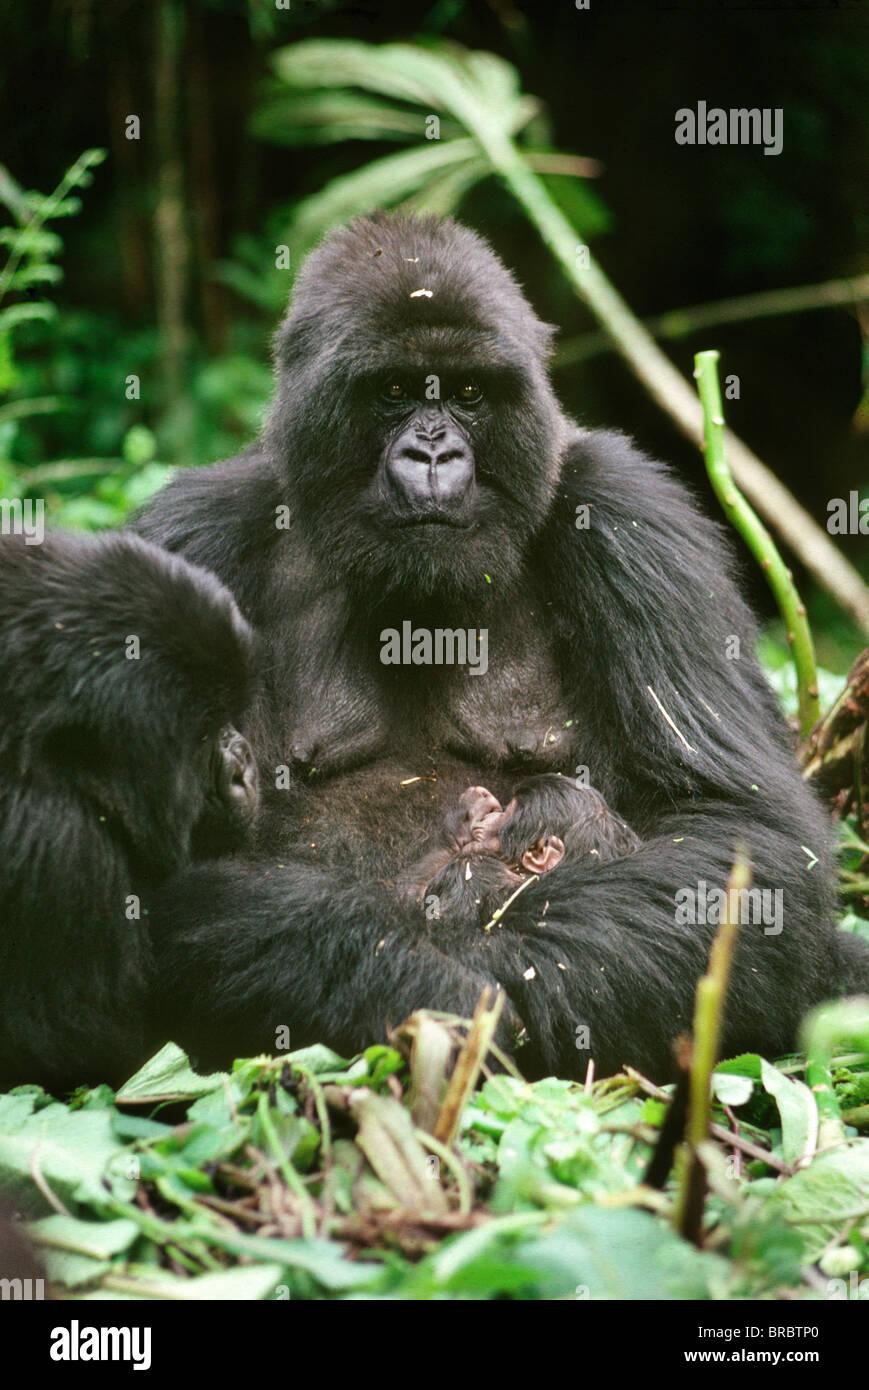 Mountain Gorillas (Gorilla g. beringei), mother Amareba with newborn infant, Virunga Volcanoes, Rwanda - Stock Image